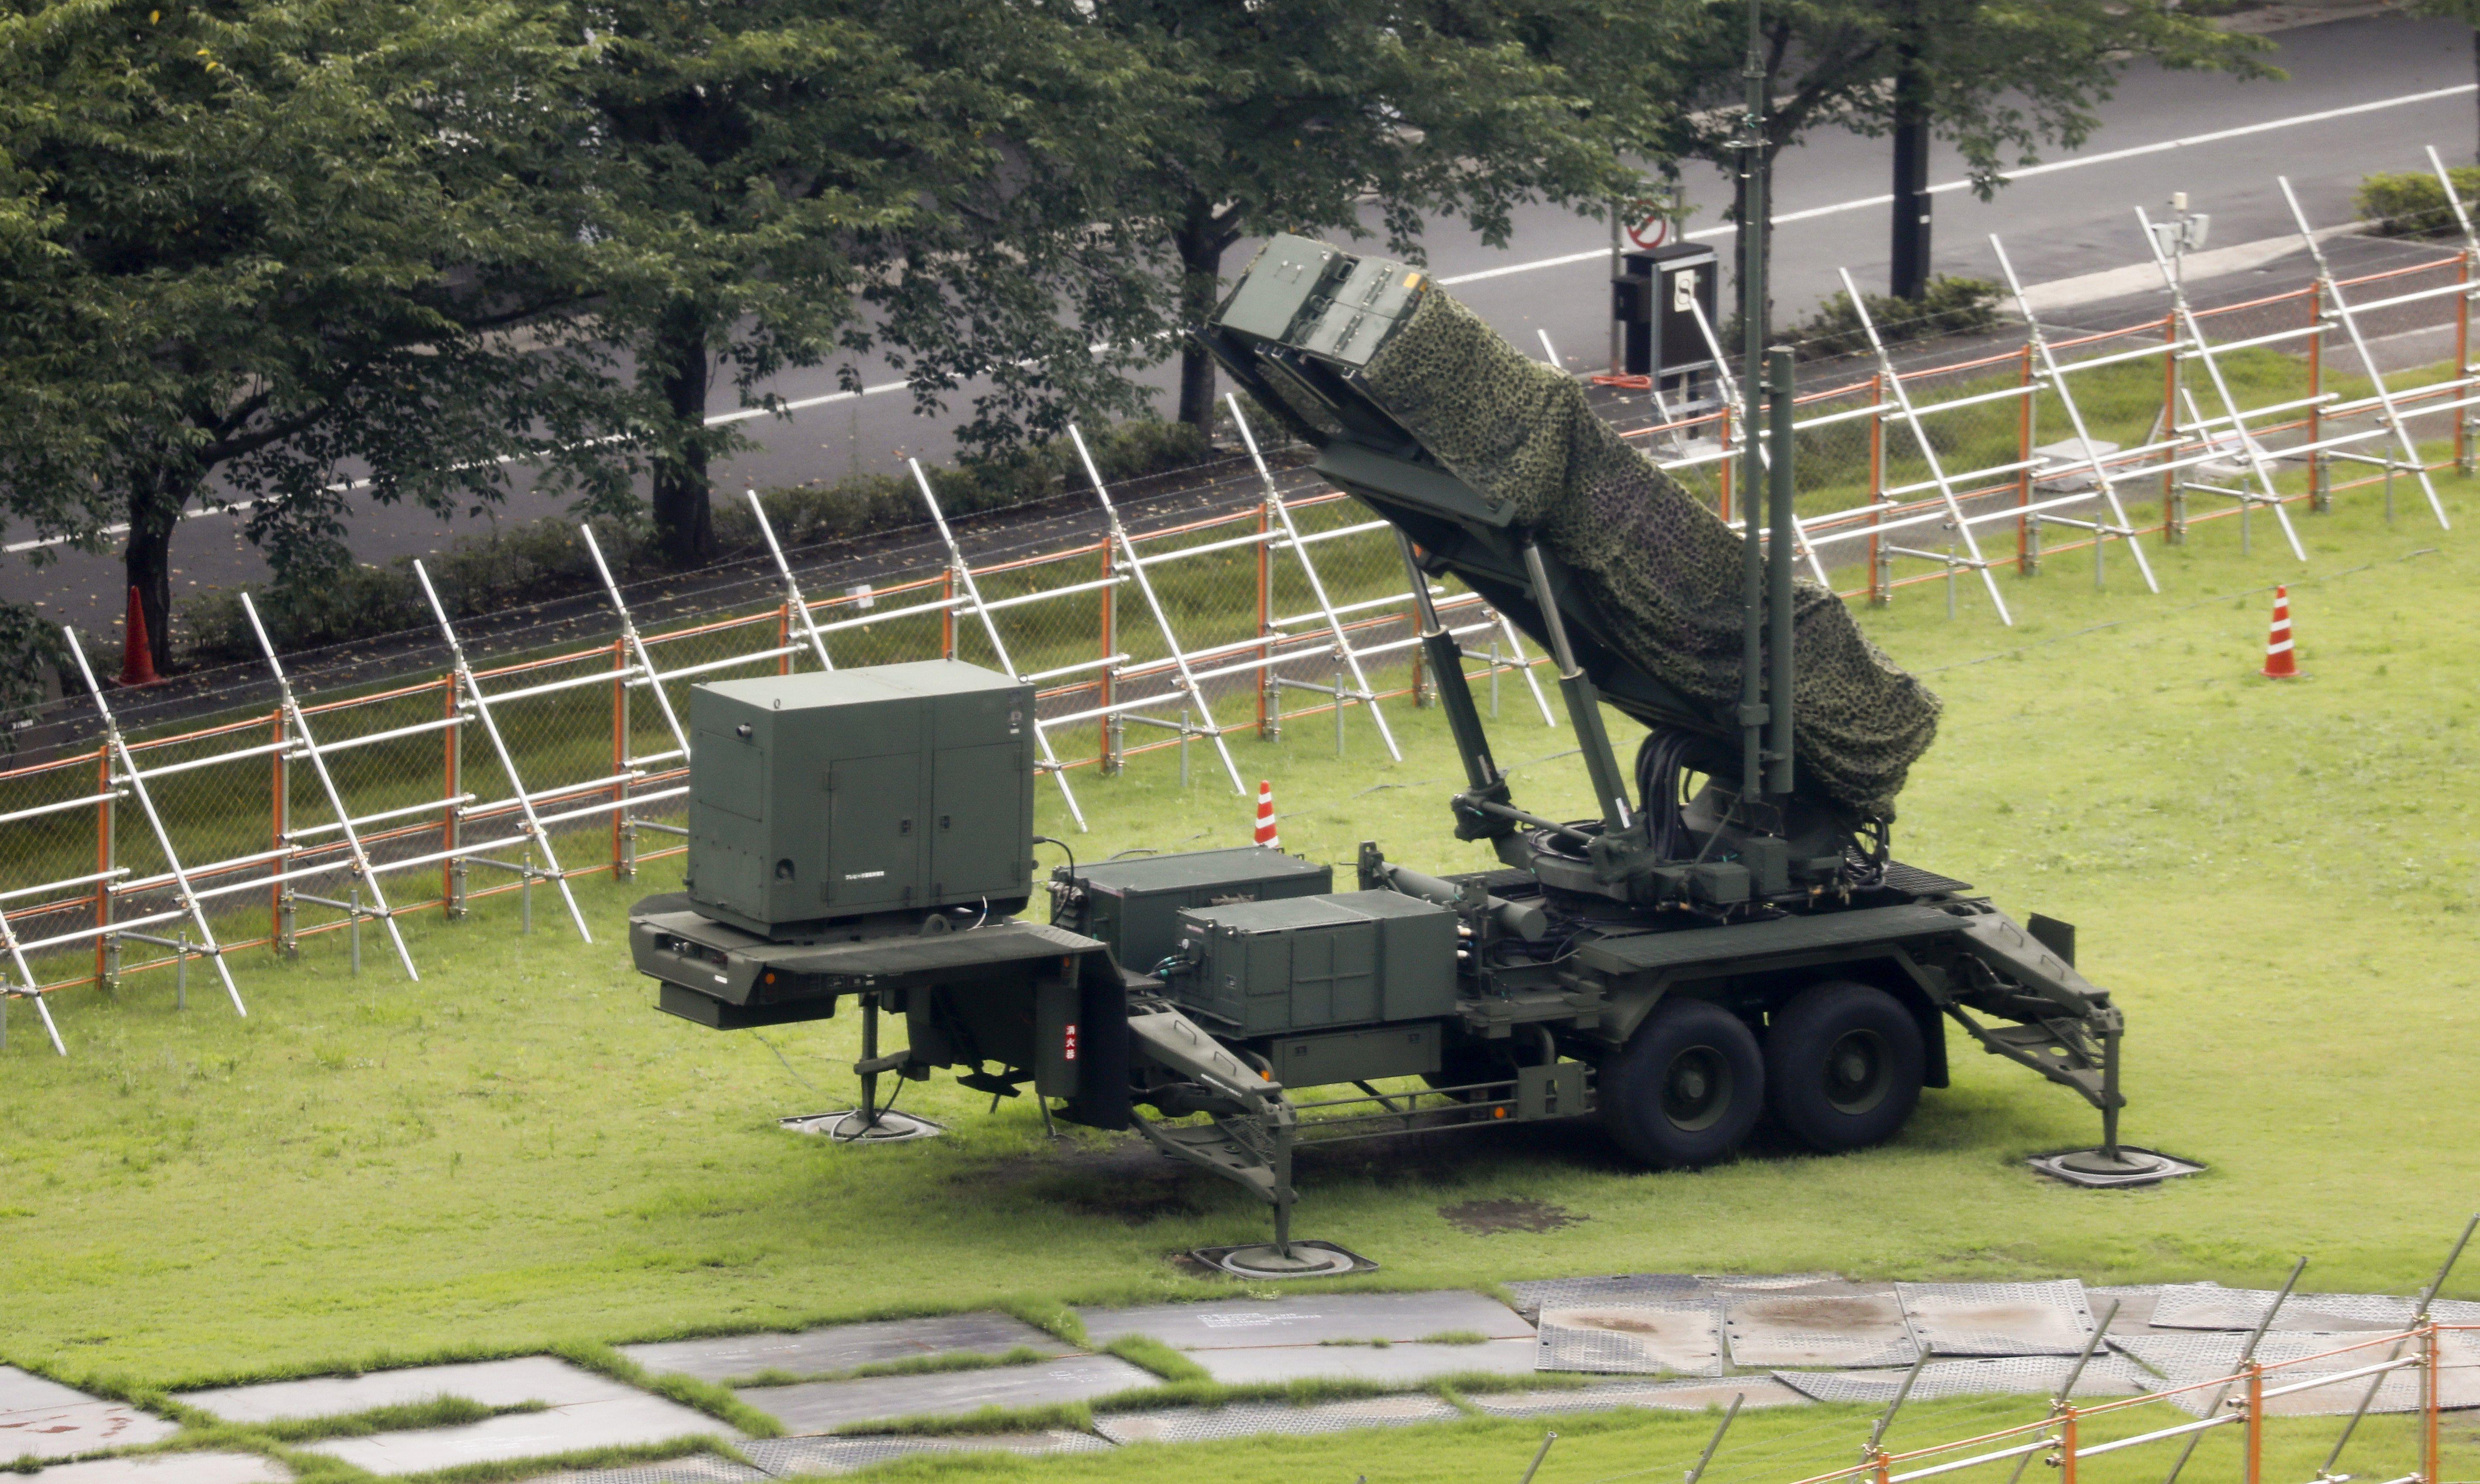 Sjeverna Koreja pokusno ispalila tri balističke rakete u Japansko more